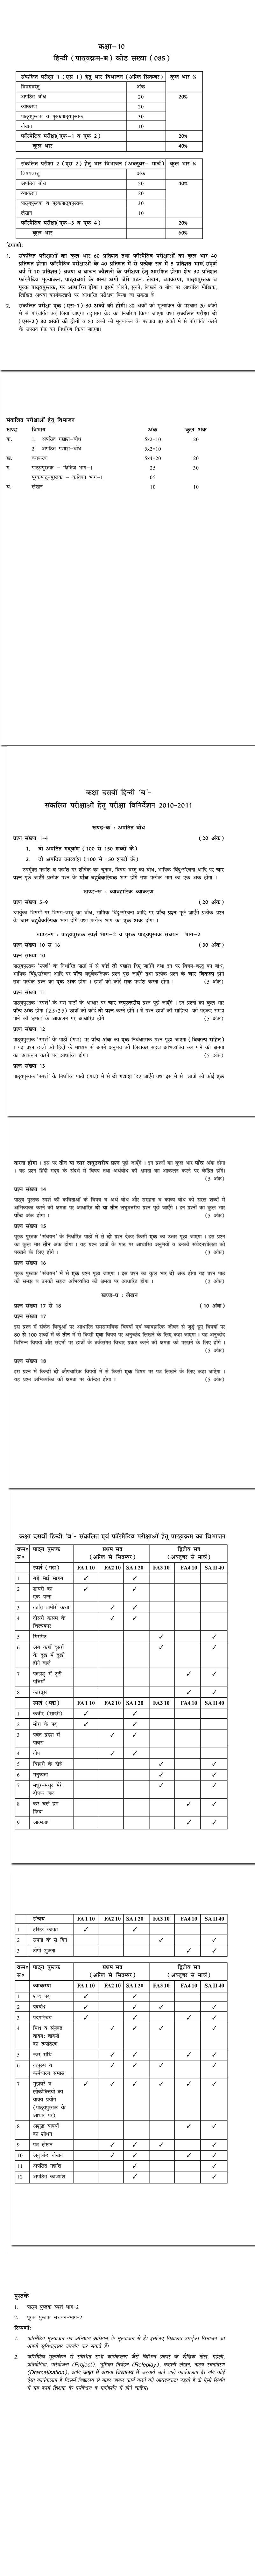 Cbse Class 10 Hindi Syllabus For 2014 15